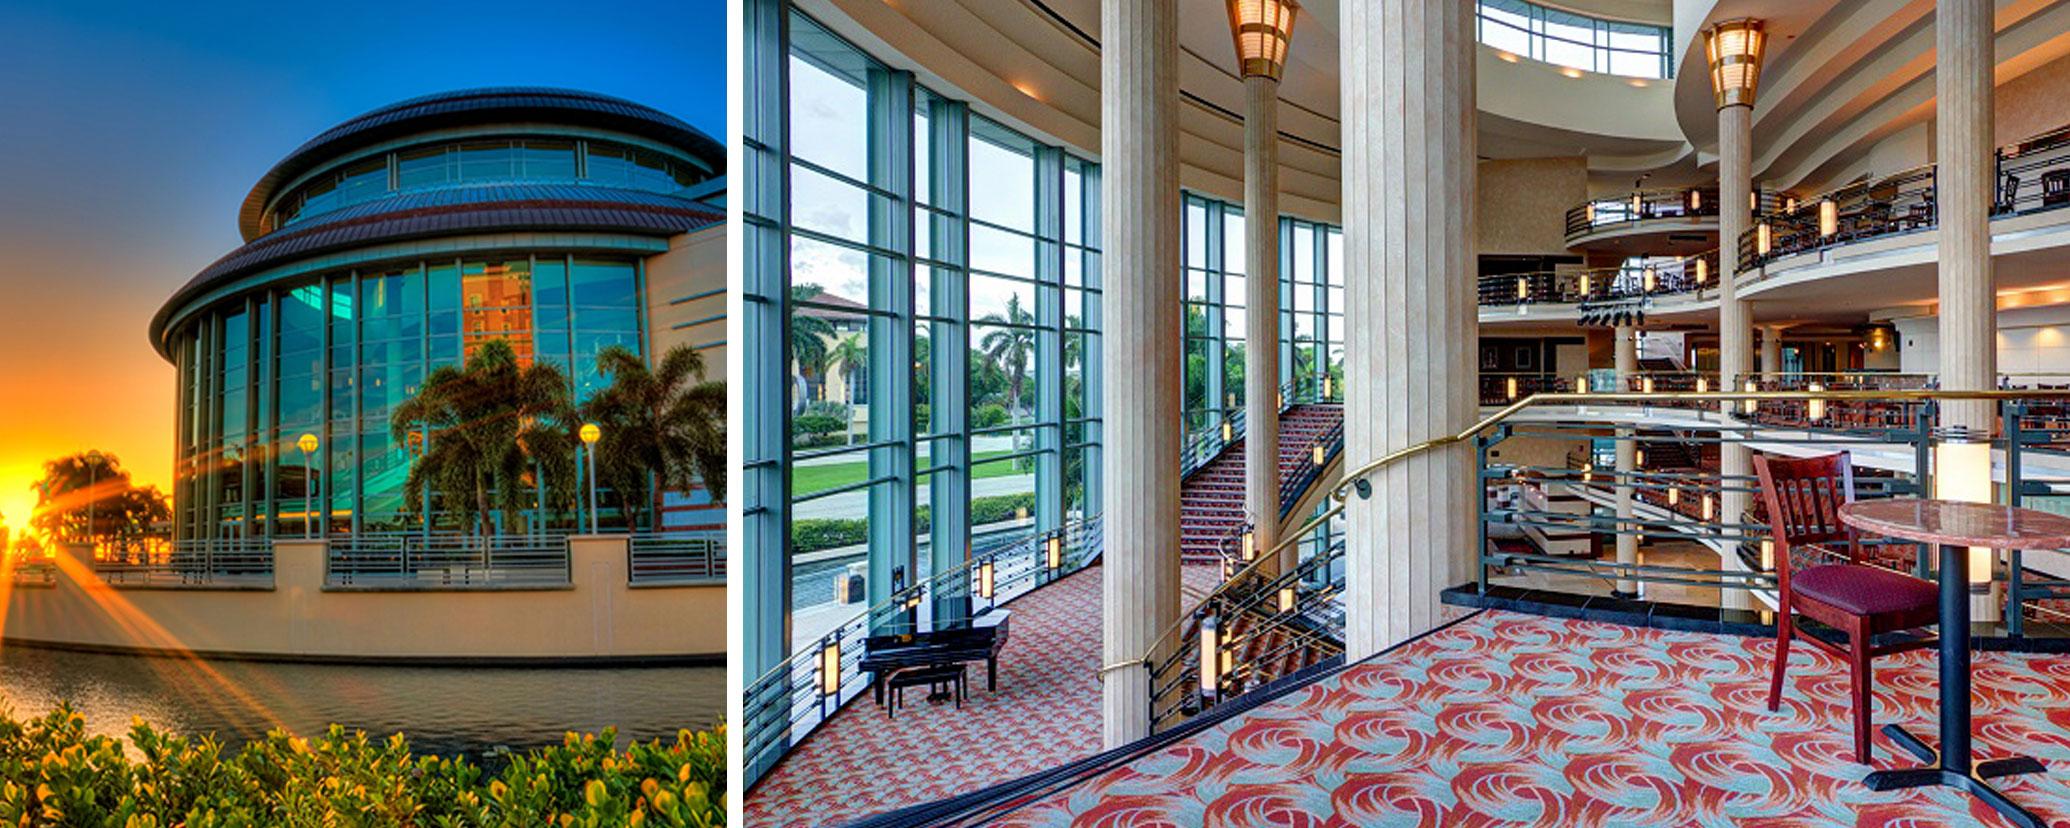 Caddell Construction - Raymond F. Kravis Center for Performing Arts, West Palm Beach, FL